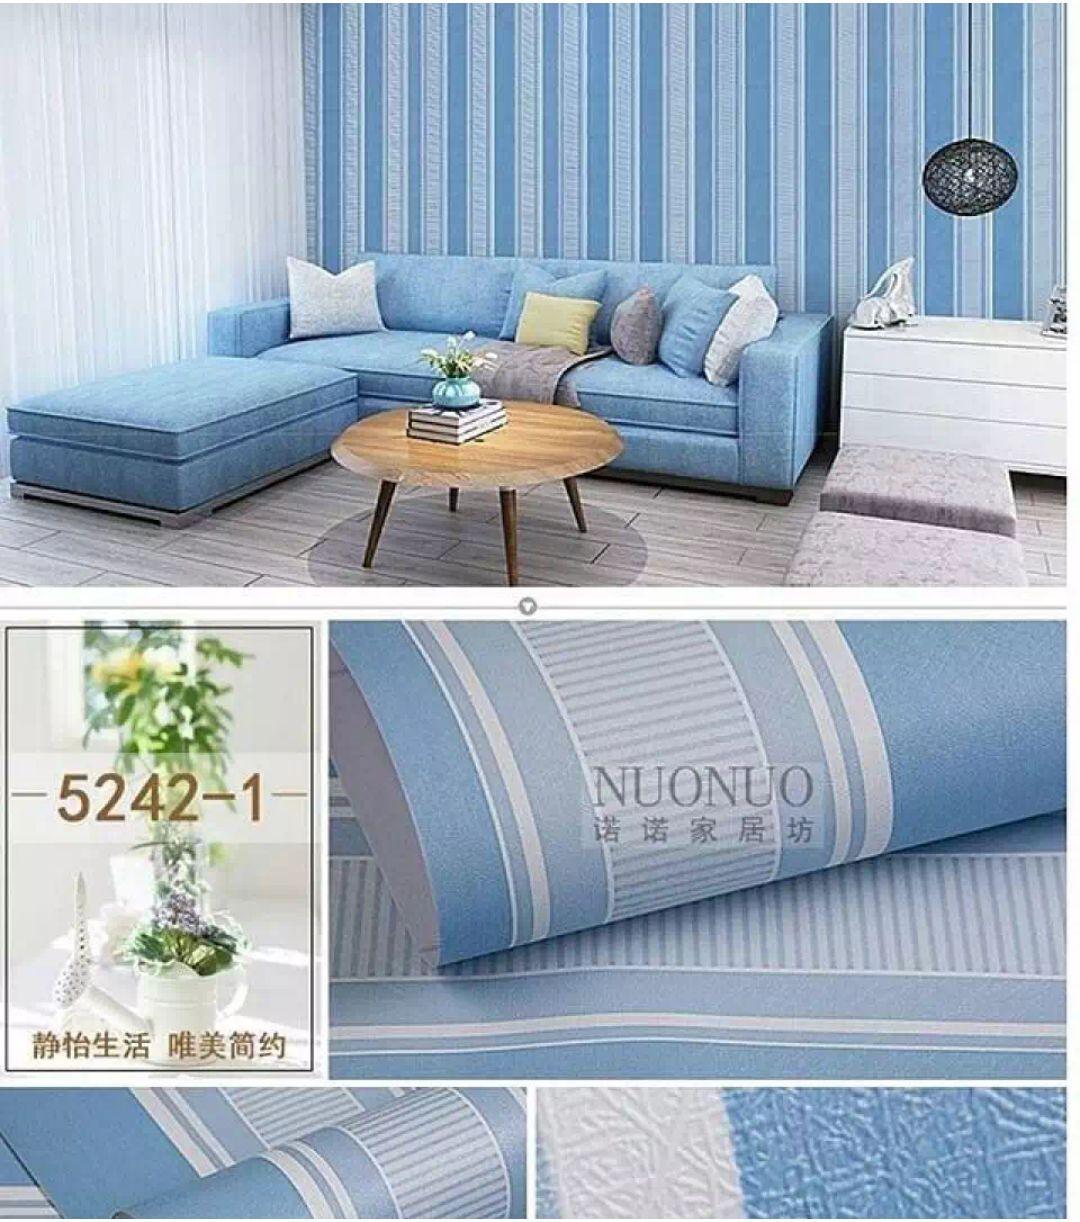 Wallpaper Stiker Dinding Motif Dan Karakter Premium Quality Size 45cm X 10M Salur Biru Baby027